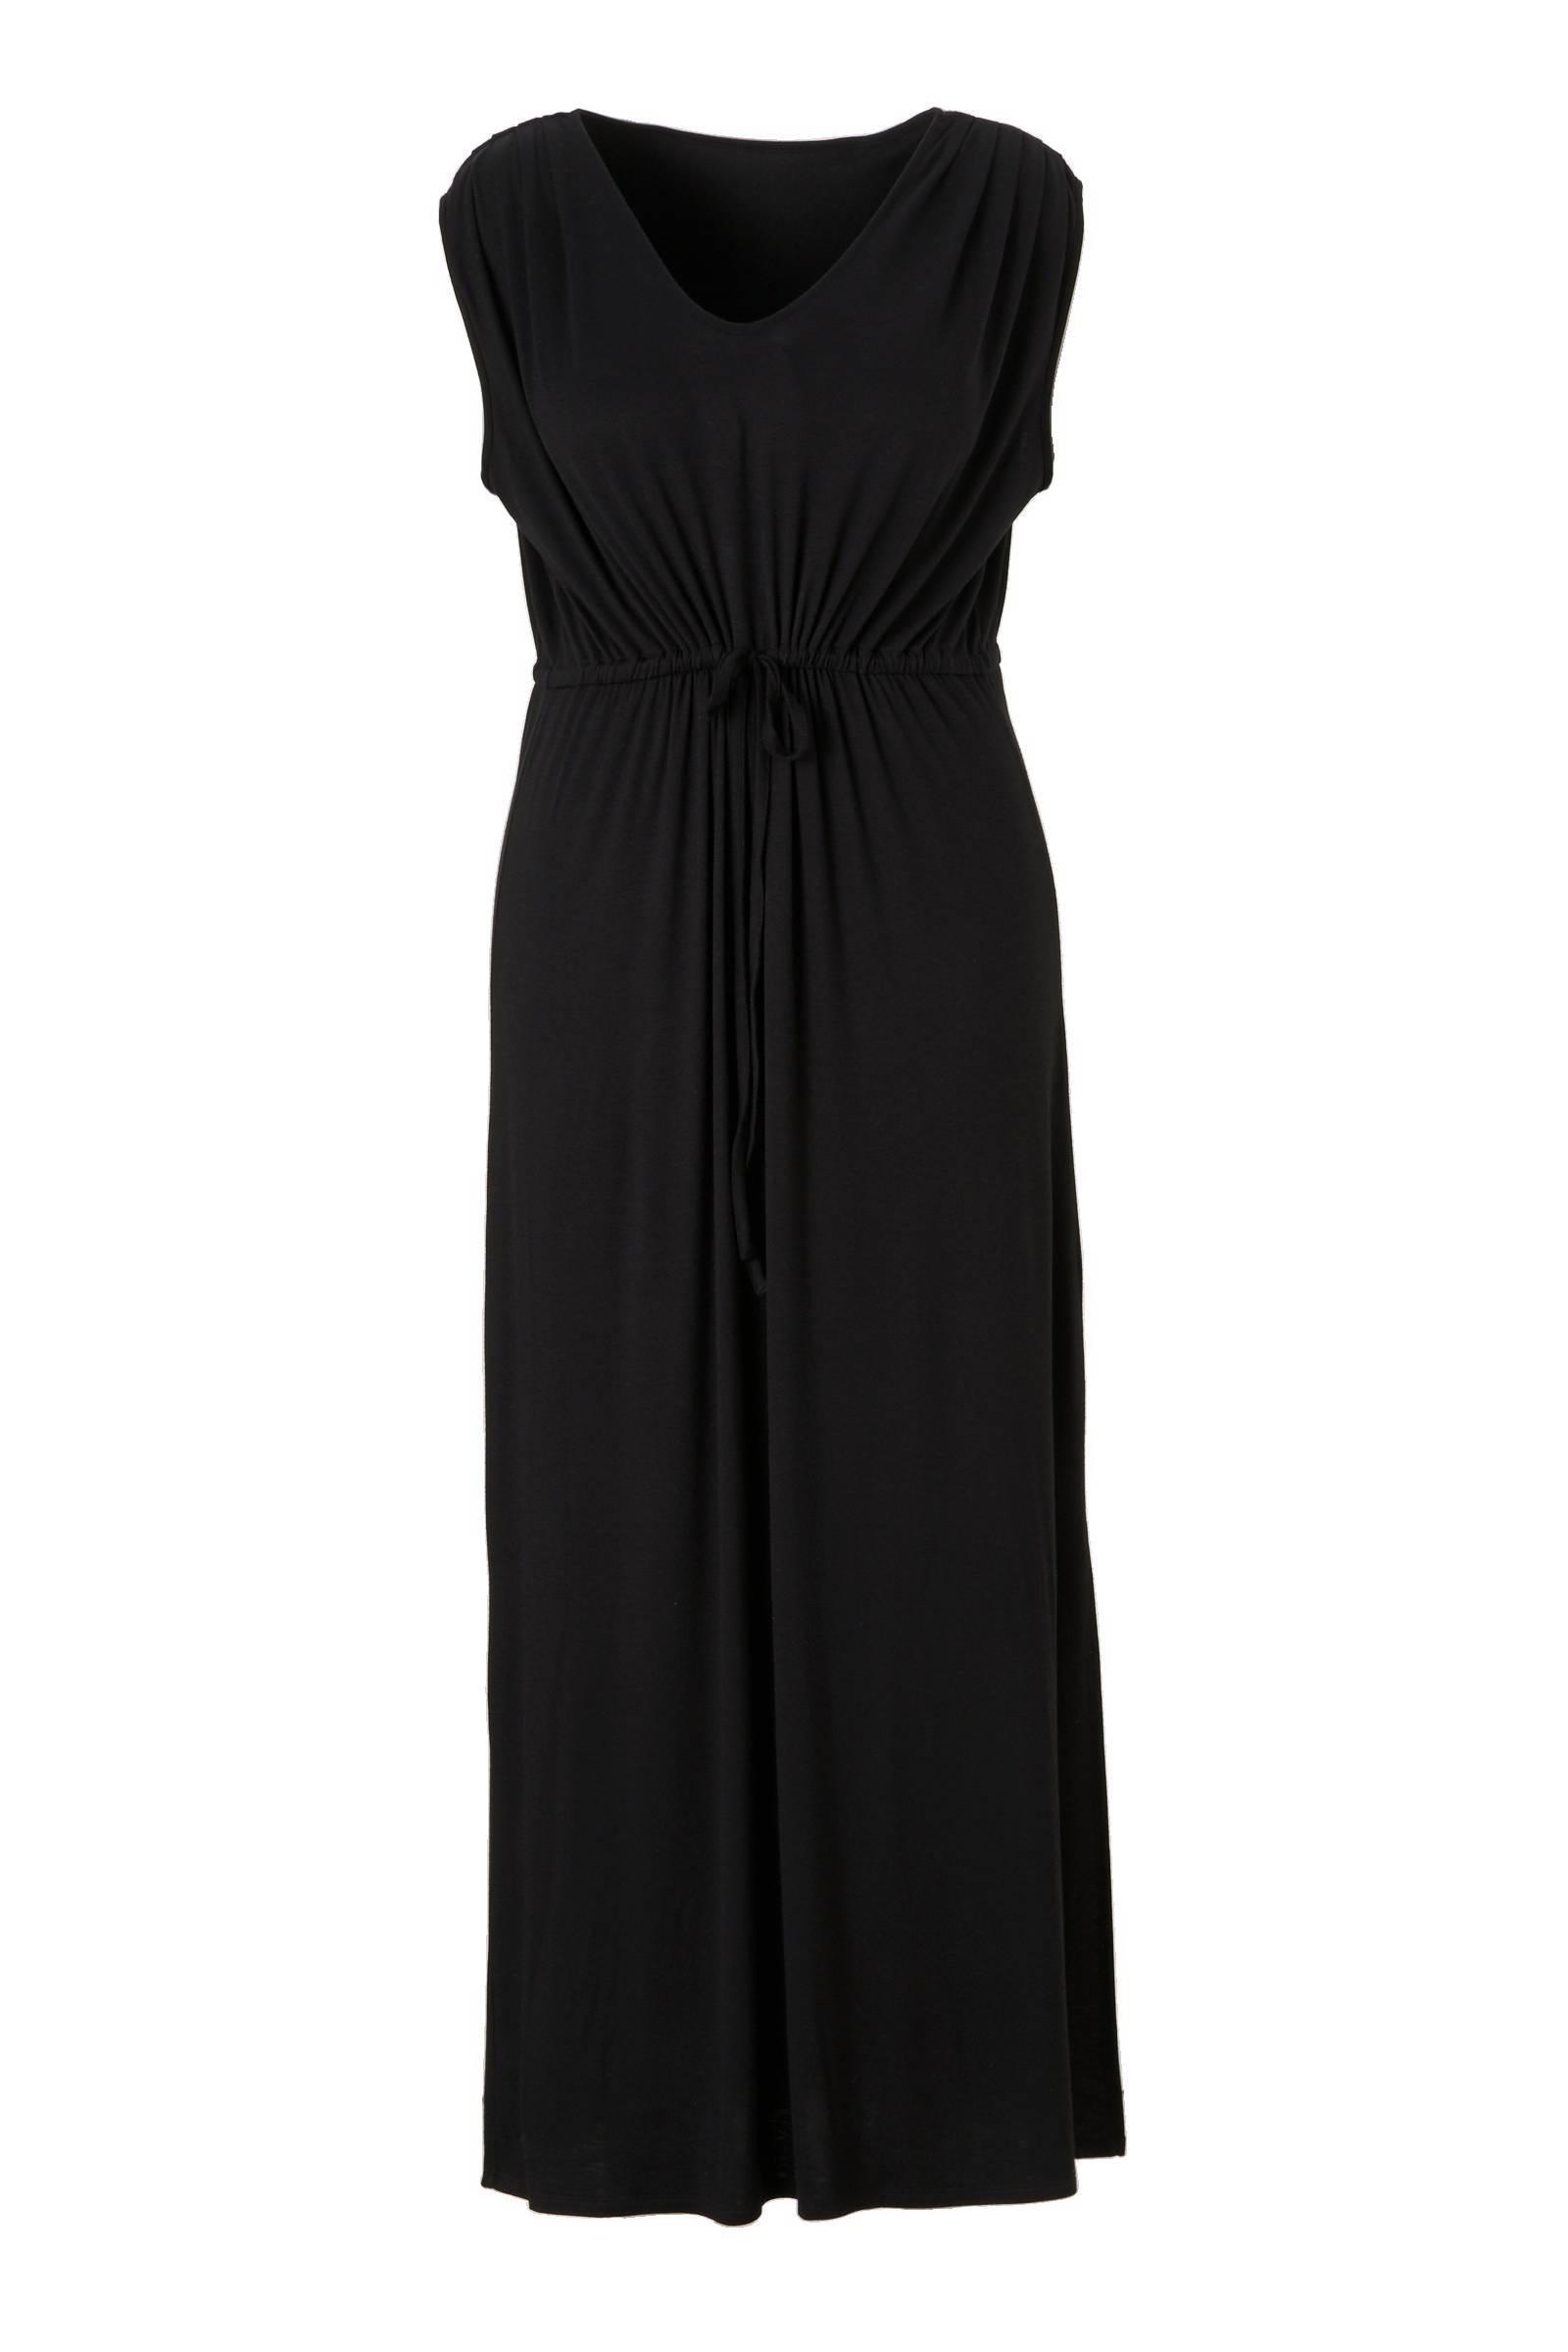 jurk zwart lang